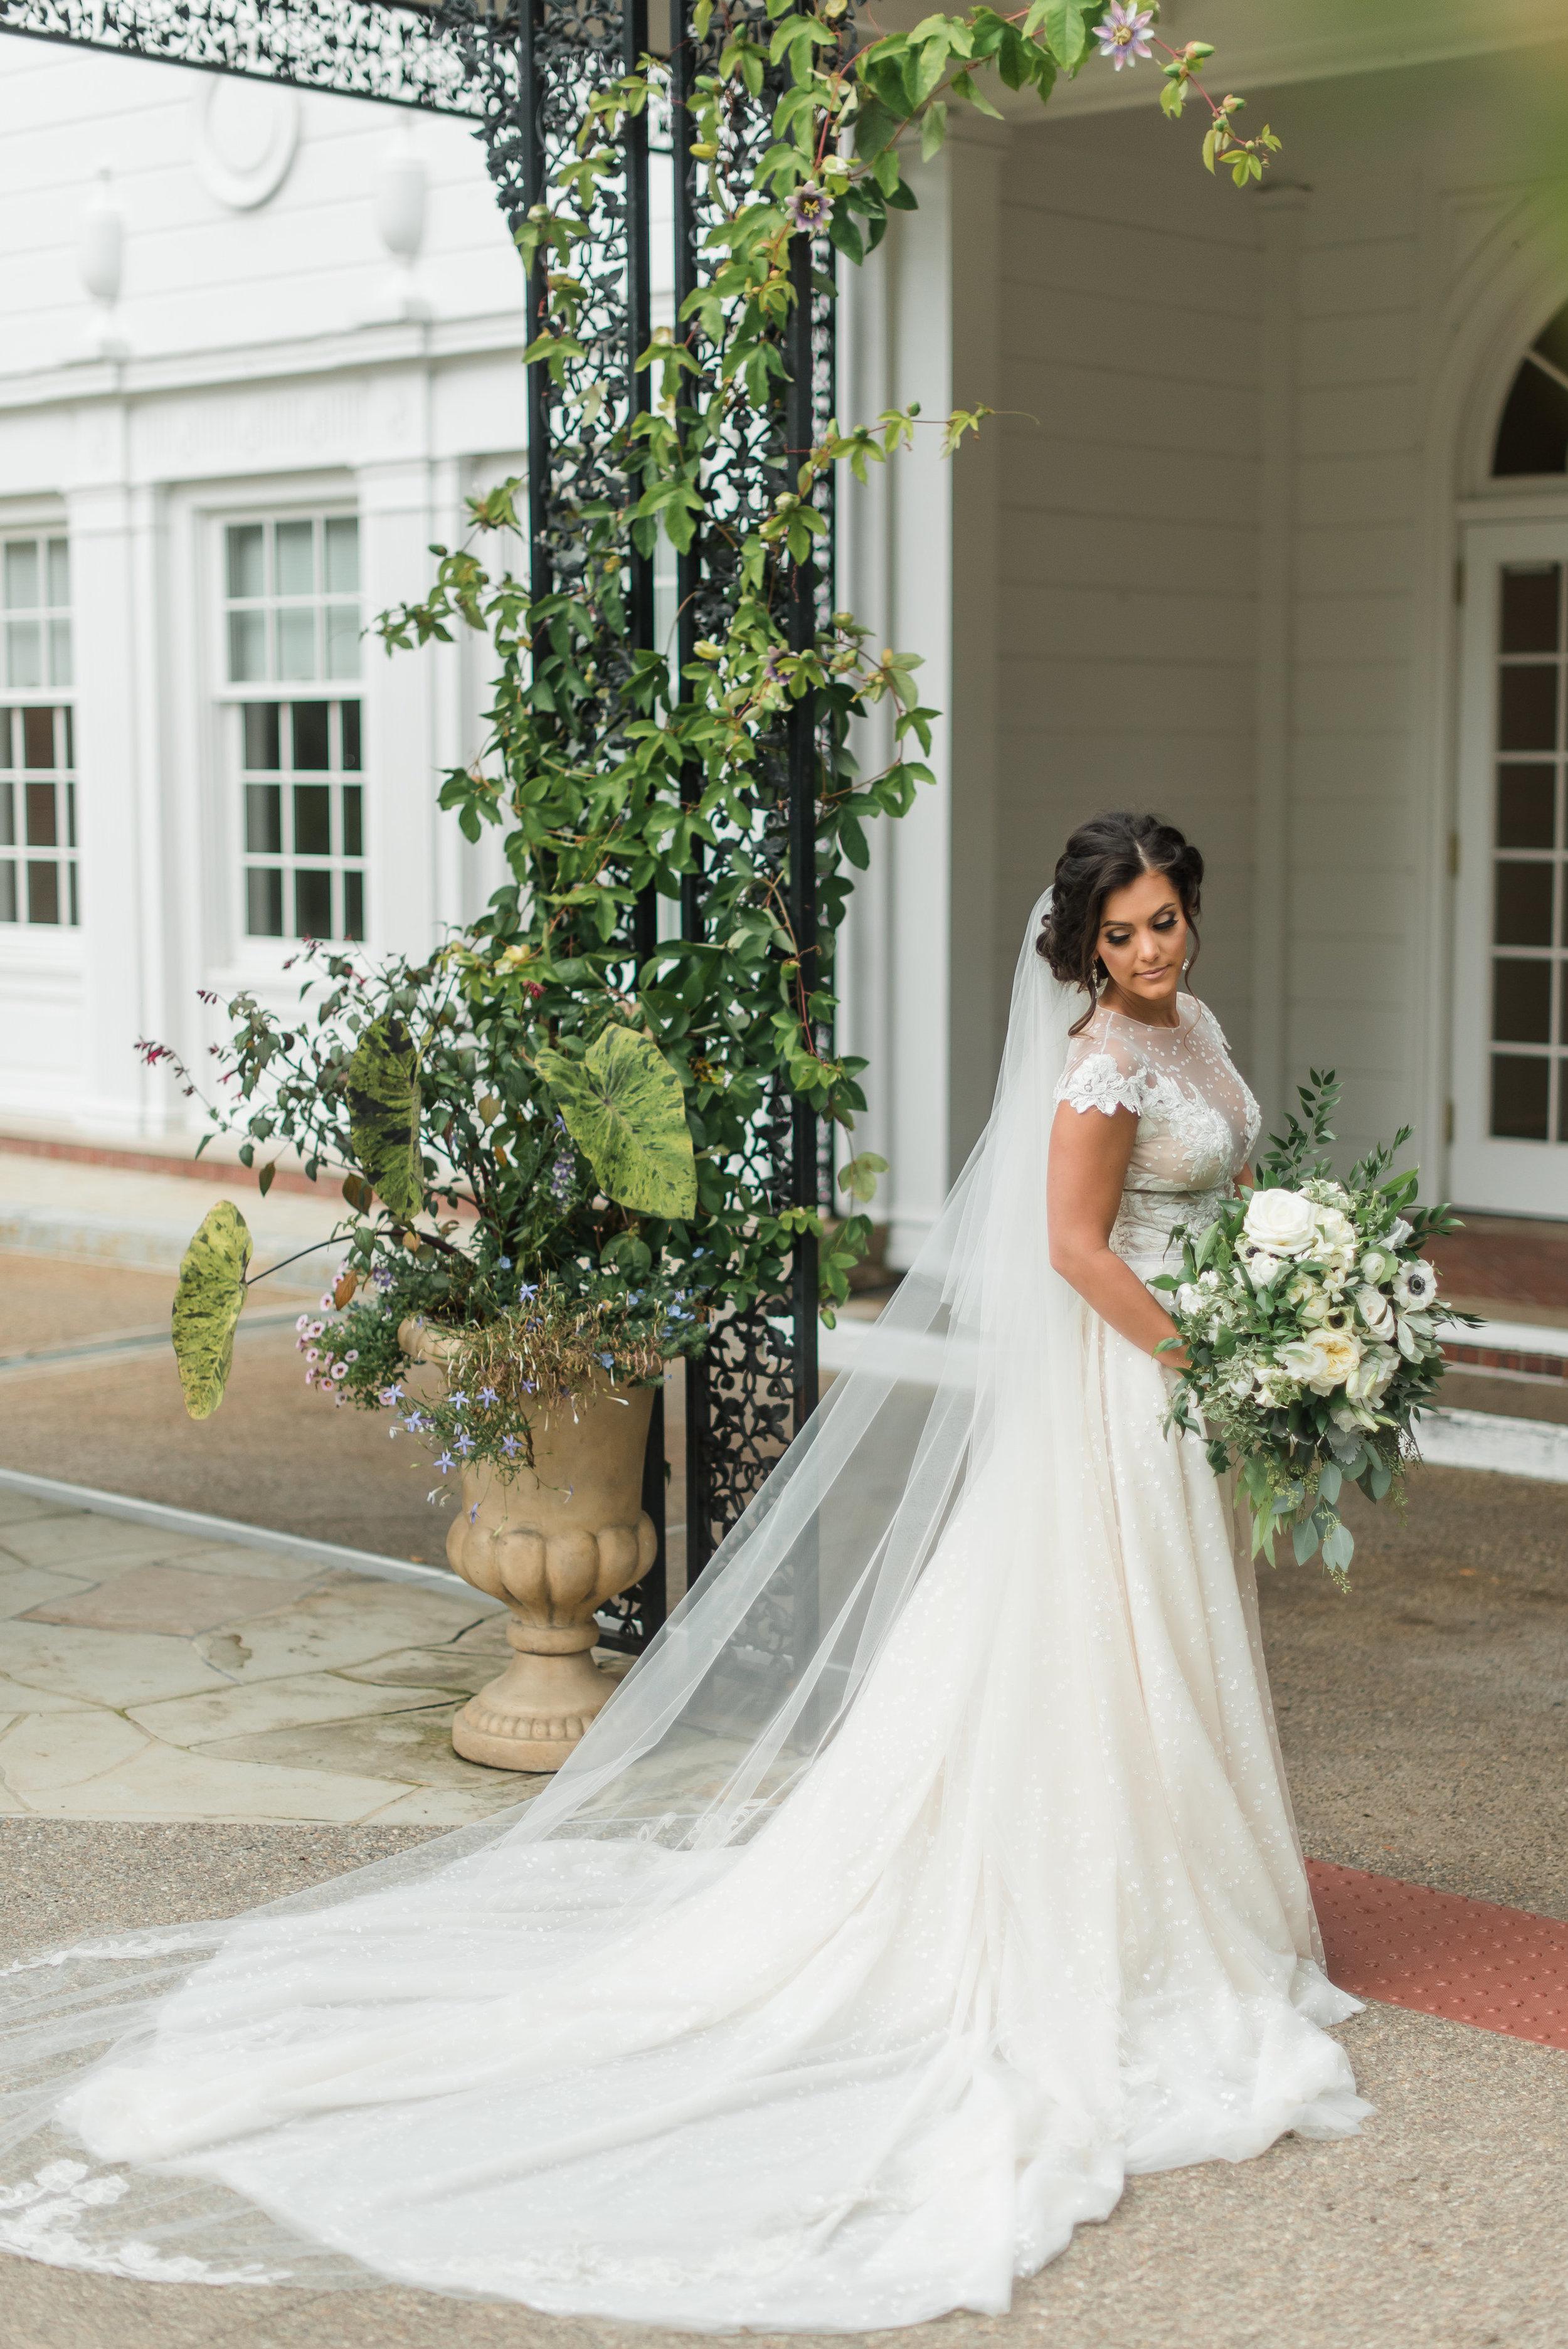 pittsburgh-wedding-photographer-classic-greenery-foxchapelgolfclub0020.jpg